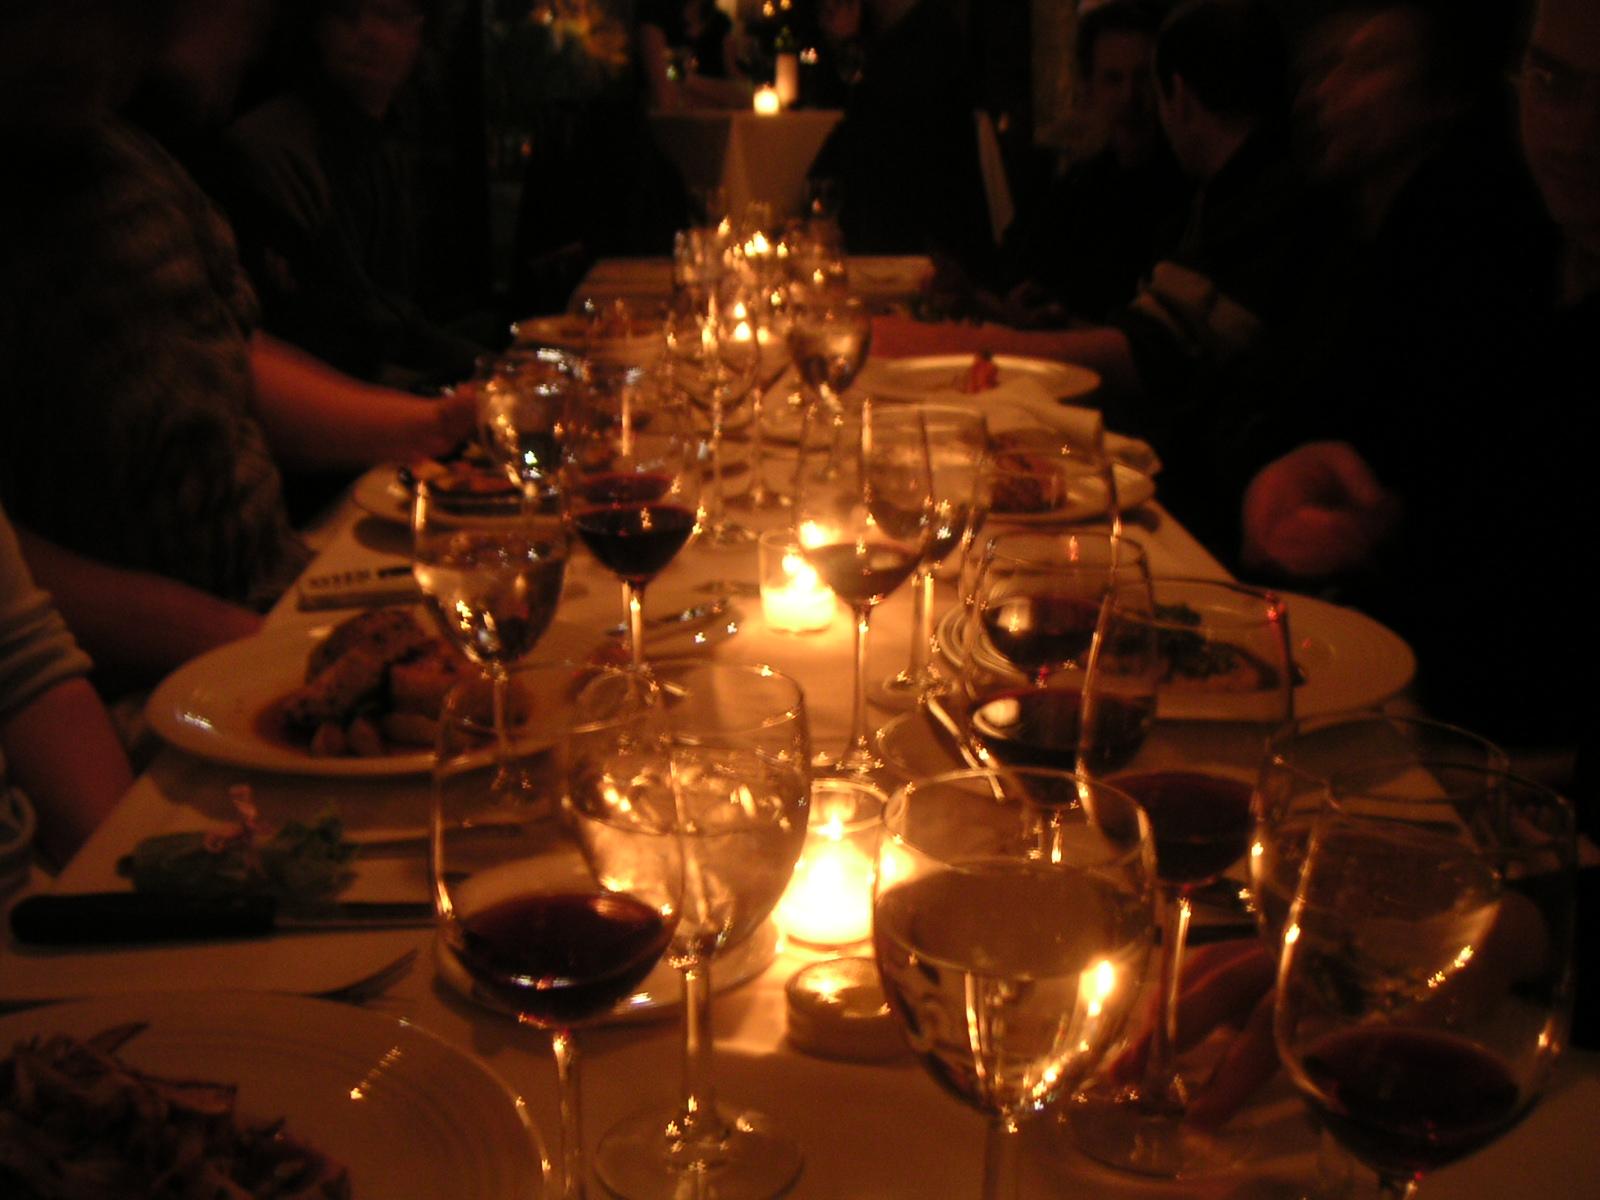 http://4.bp.blogspot.com/-pPa5wciLyok/TwRiozLSvWI/AAAAAAAAJTM/MS6SDYyPZ2M/s1600/candle+light+_05.JPG